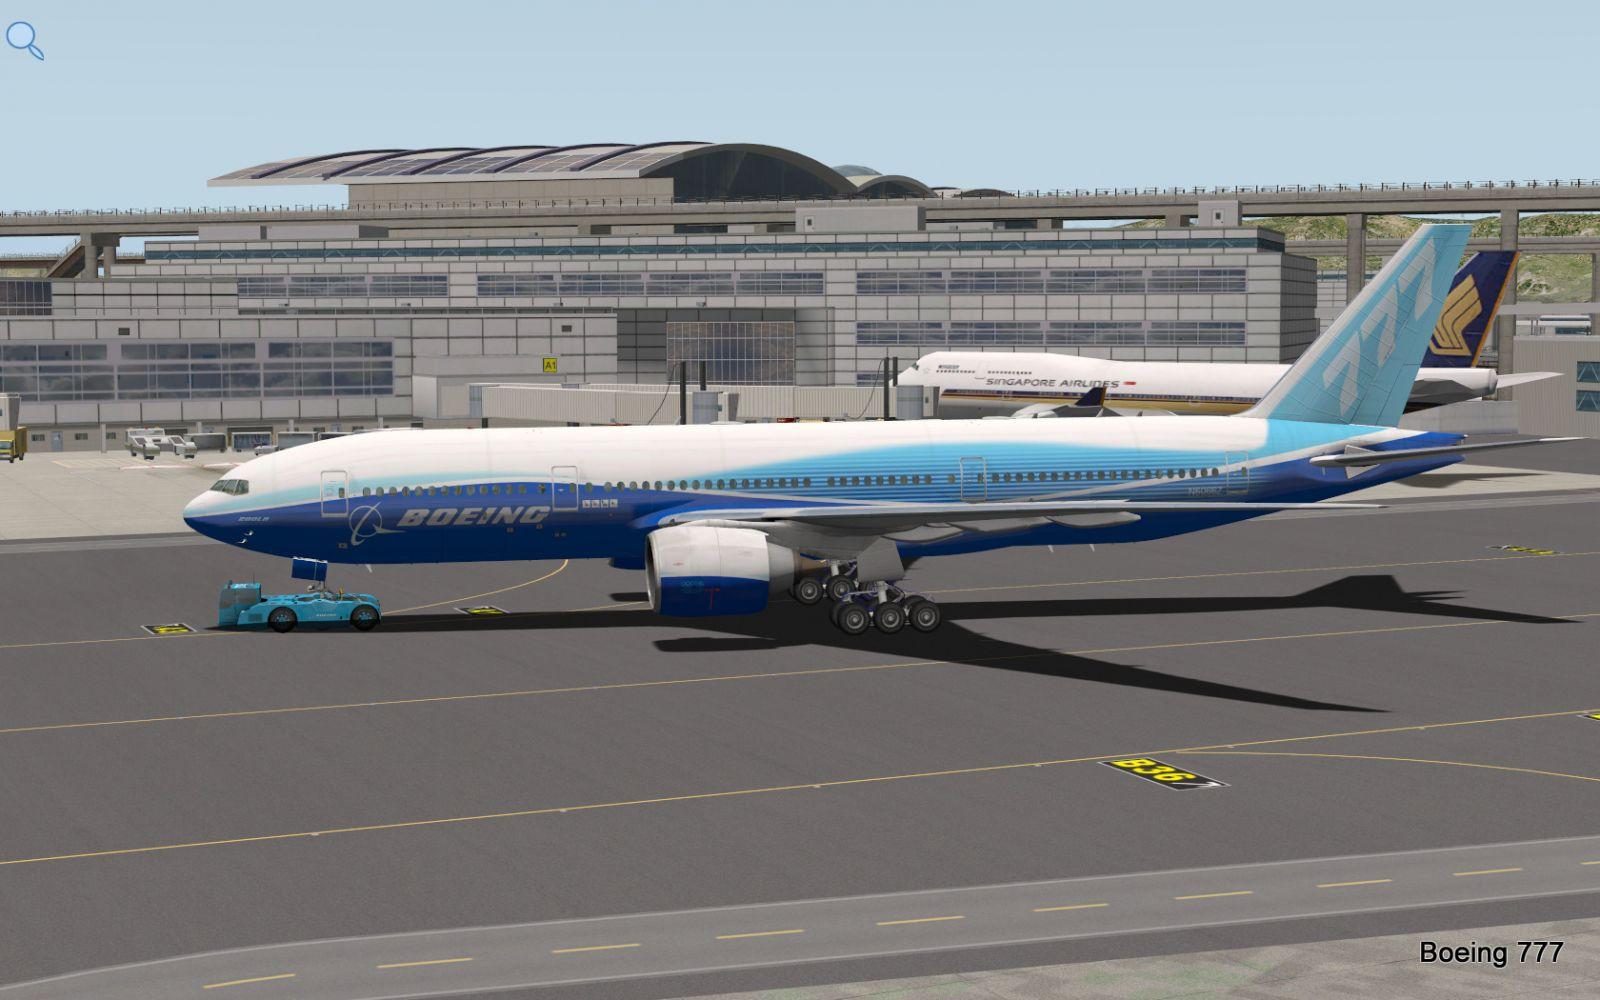 Aircraft update: boeing 777 worldliner pro + extended pack v1. 6.